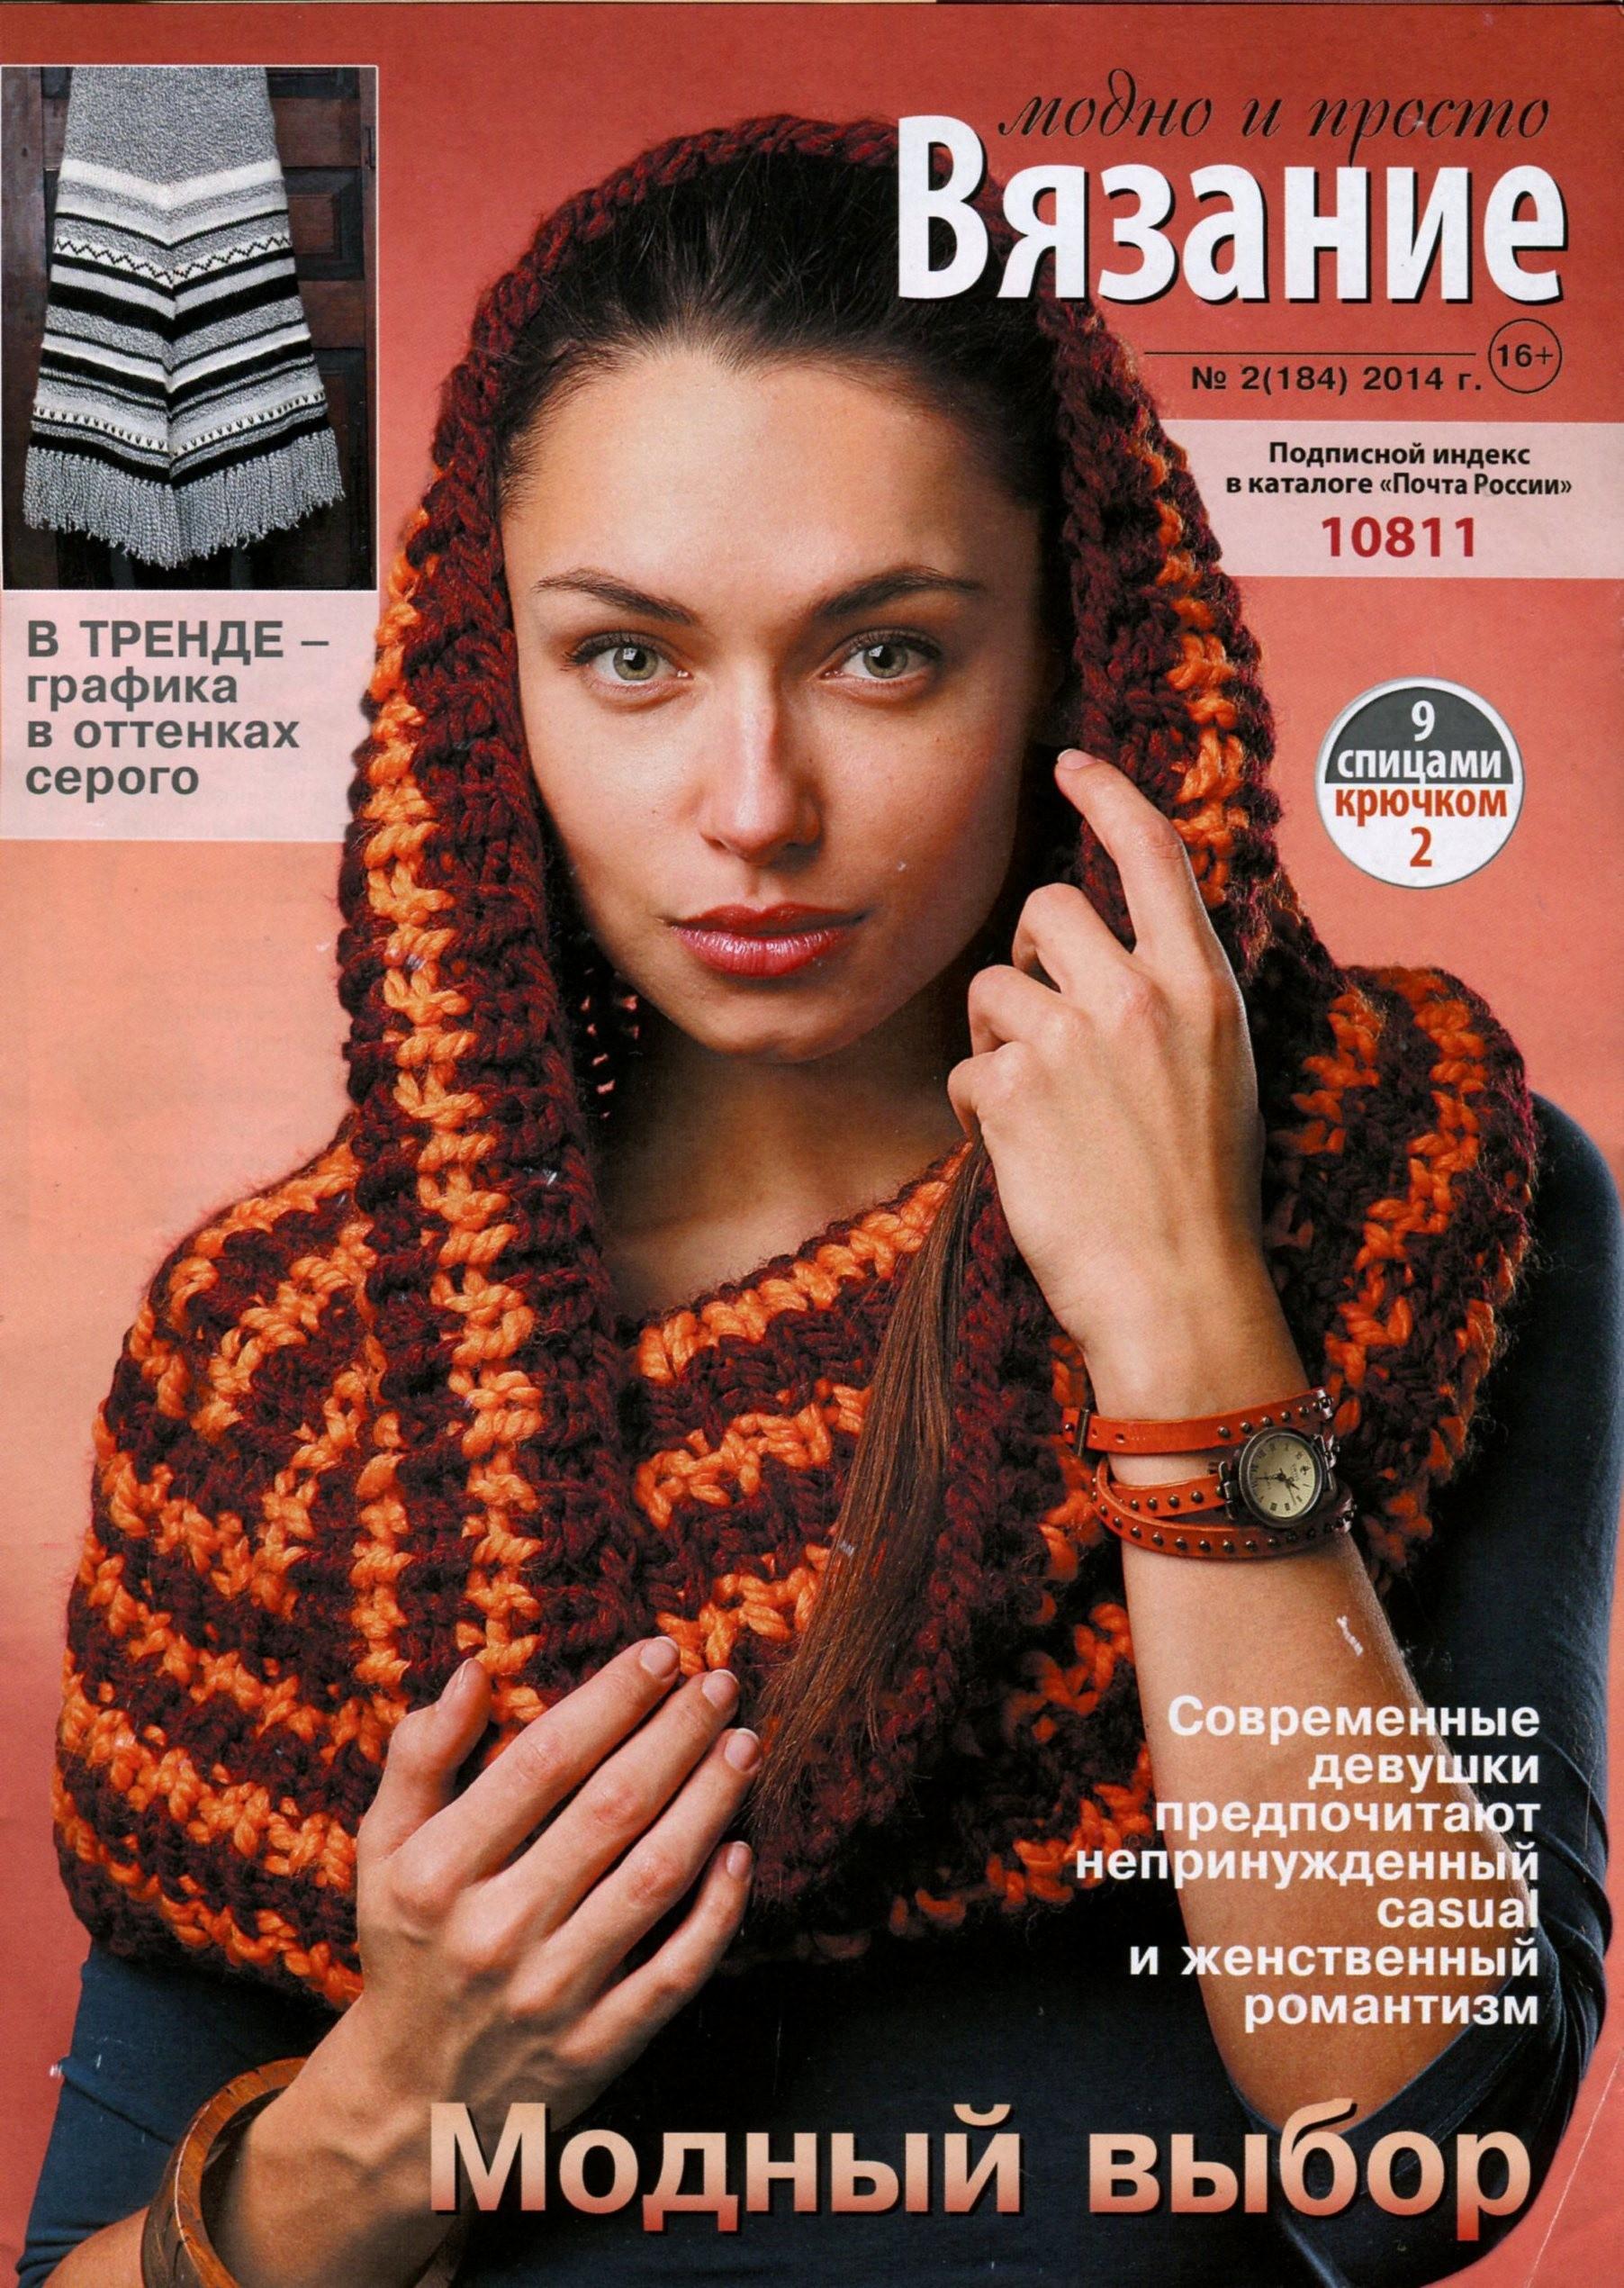 журнал вязание октябрь 2011г.